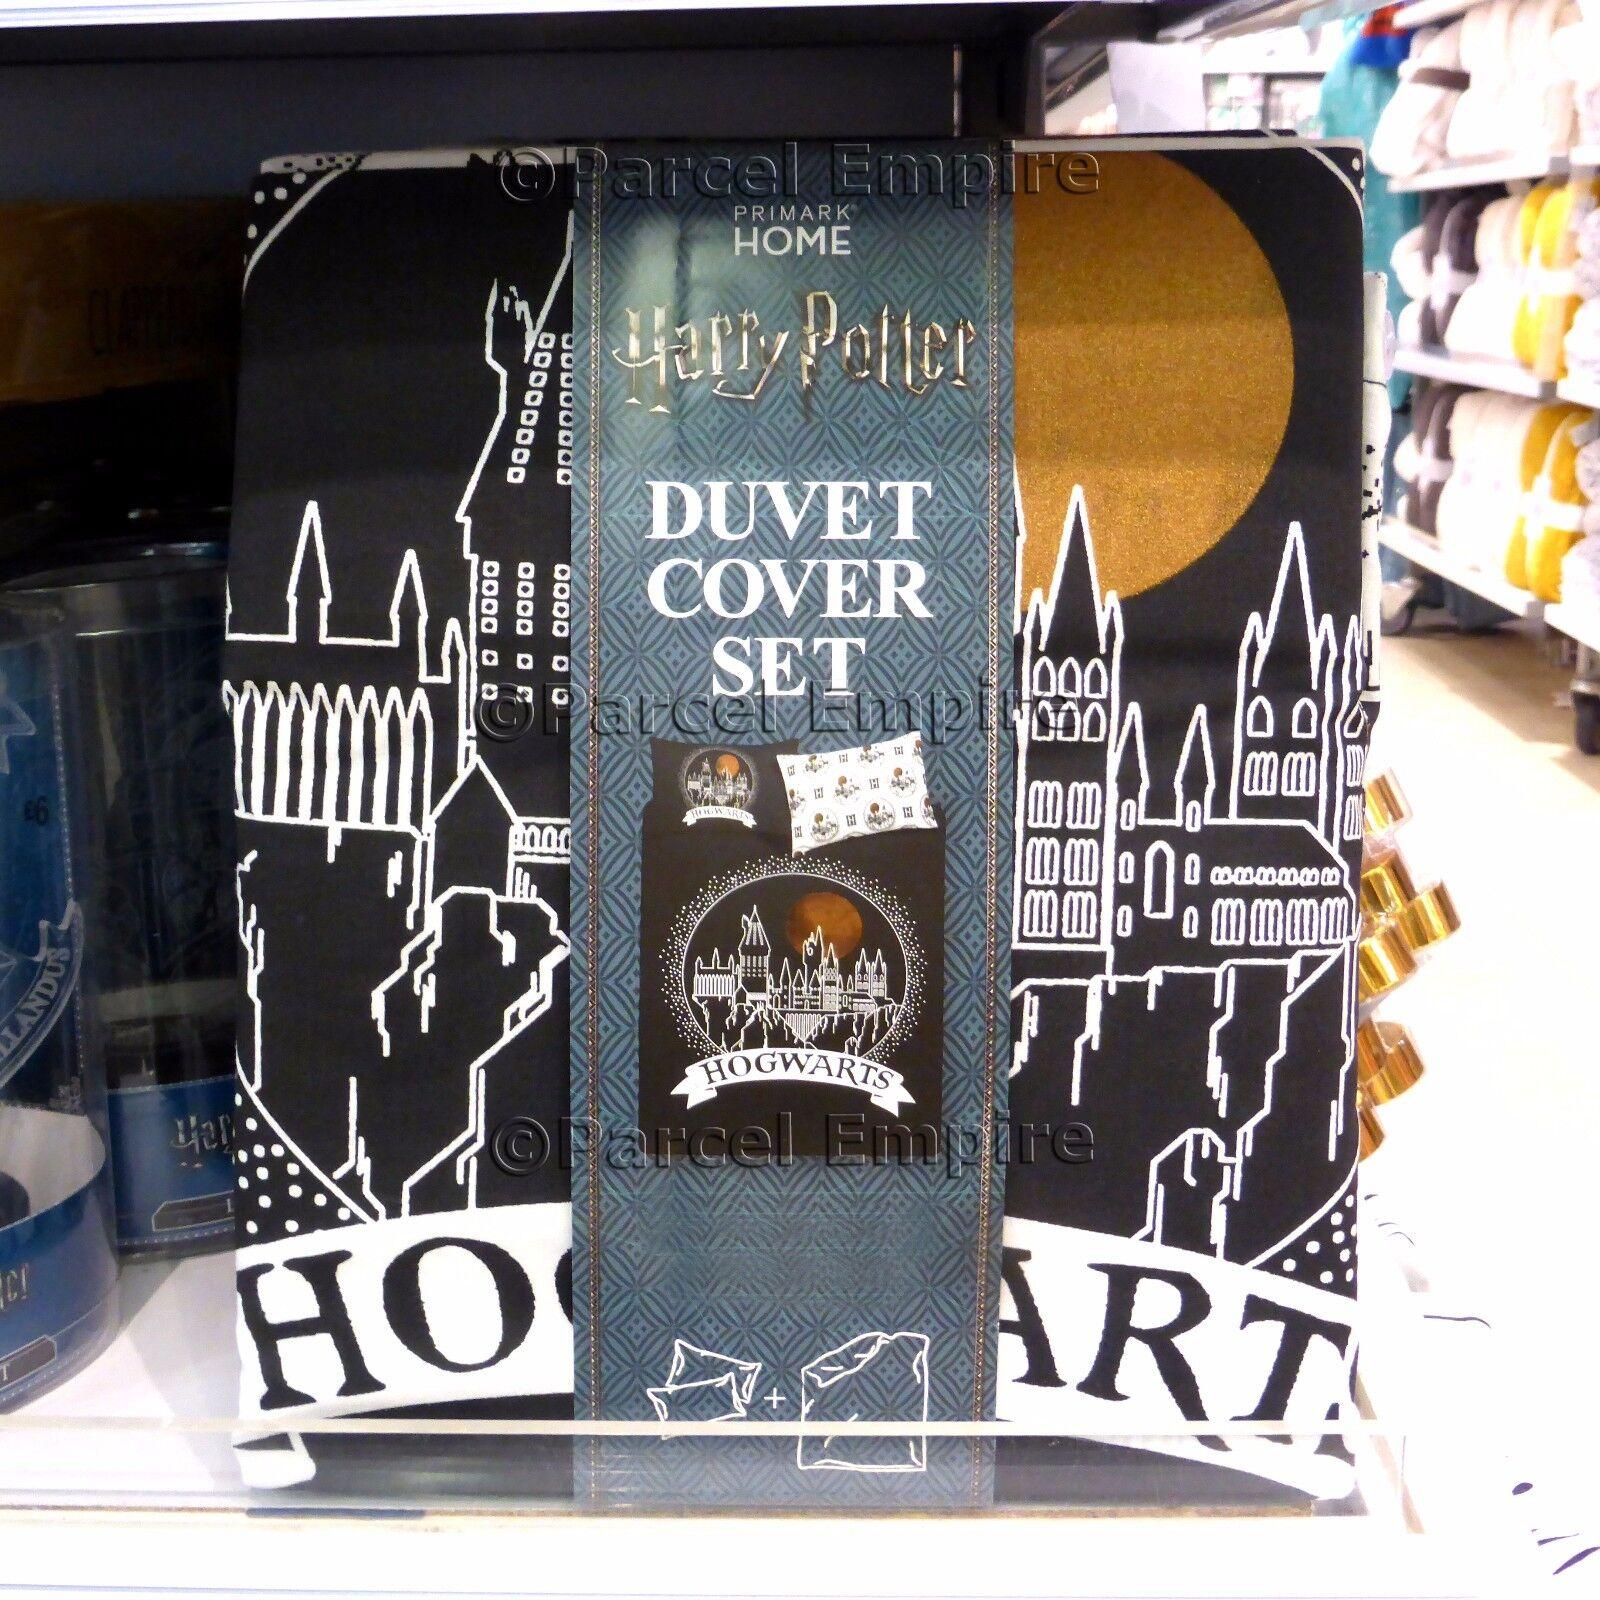 HARRY POTTER Official SINGLE DUVET COVER SET Hogwarts Xmas Gift  Rowling